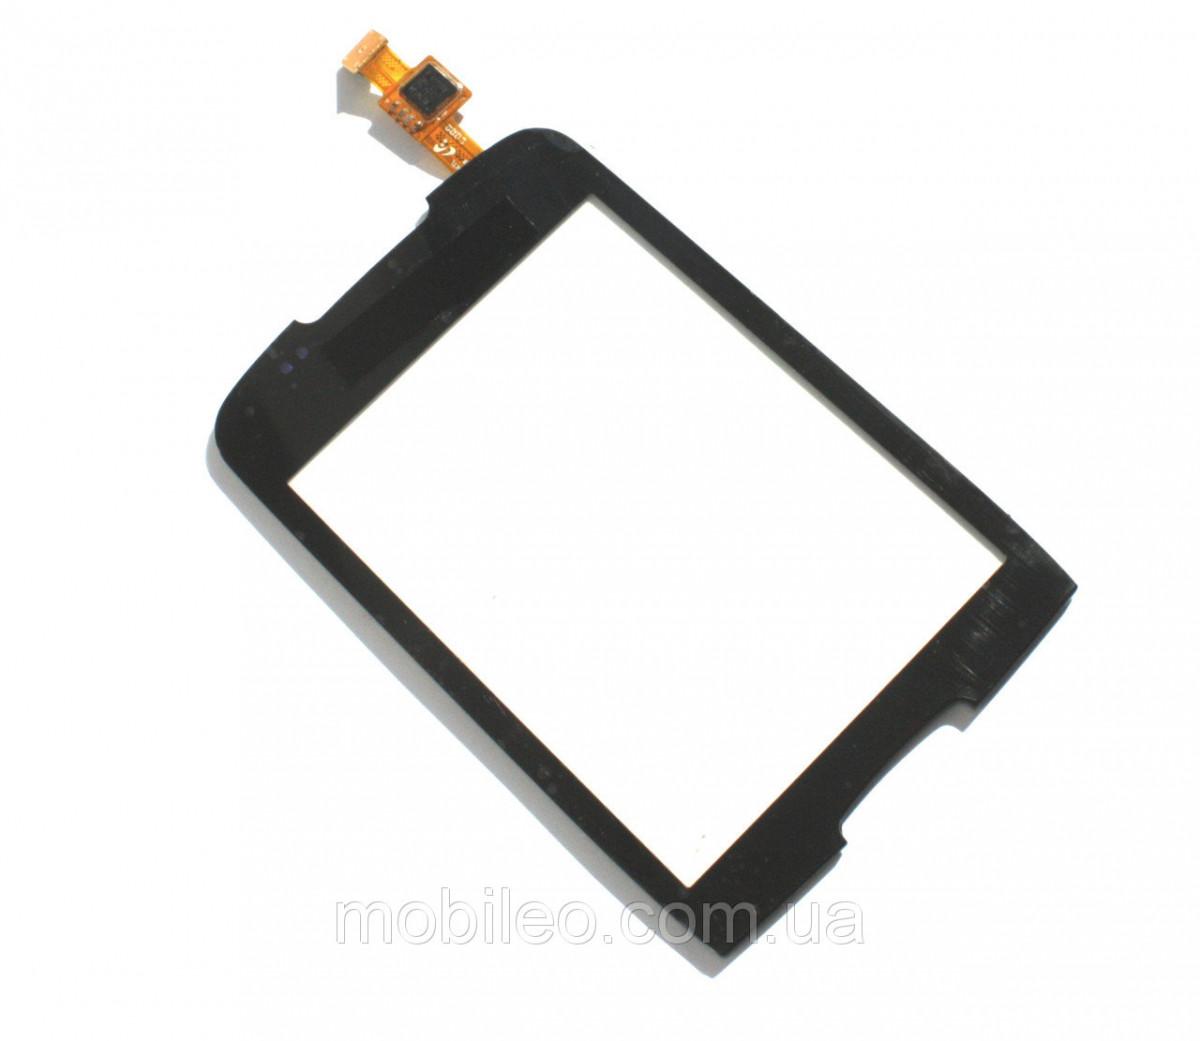 Сенсорный экран (тачскрин) Samsung S5570 Galaxy mini чёрный оригинал